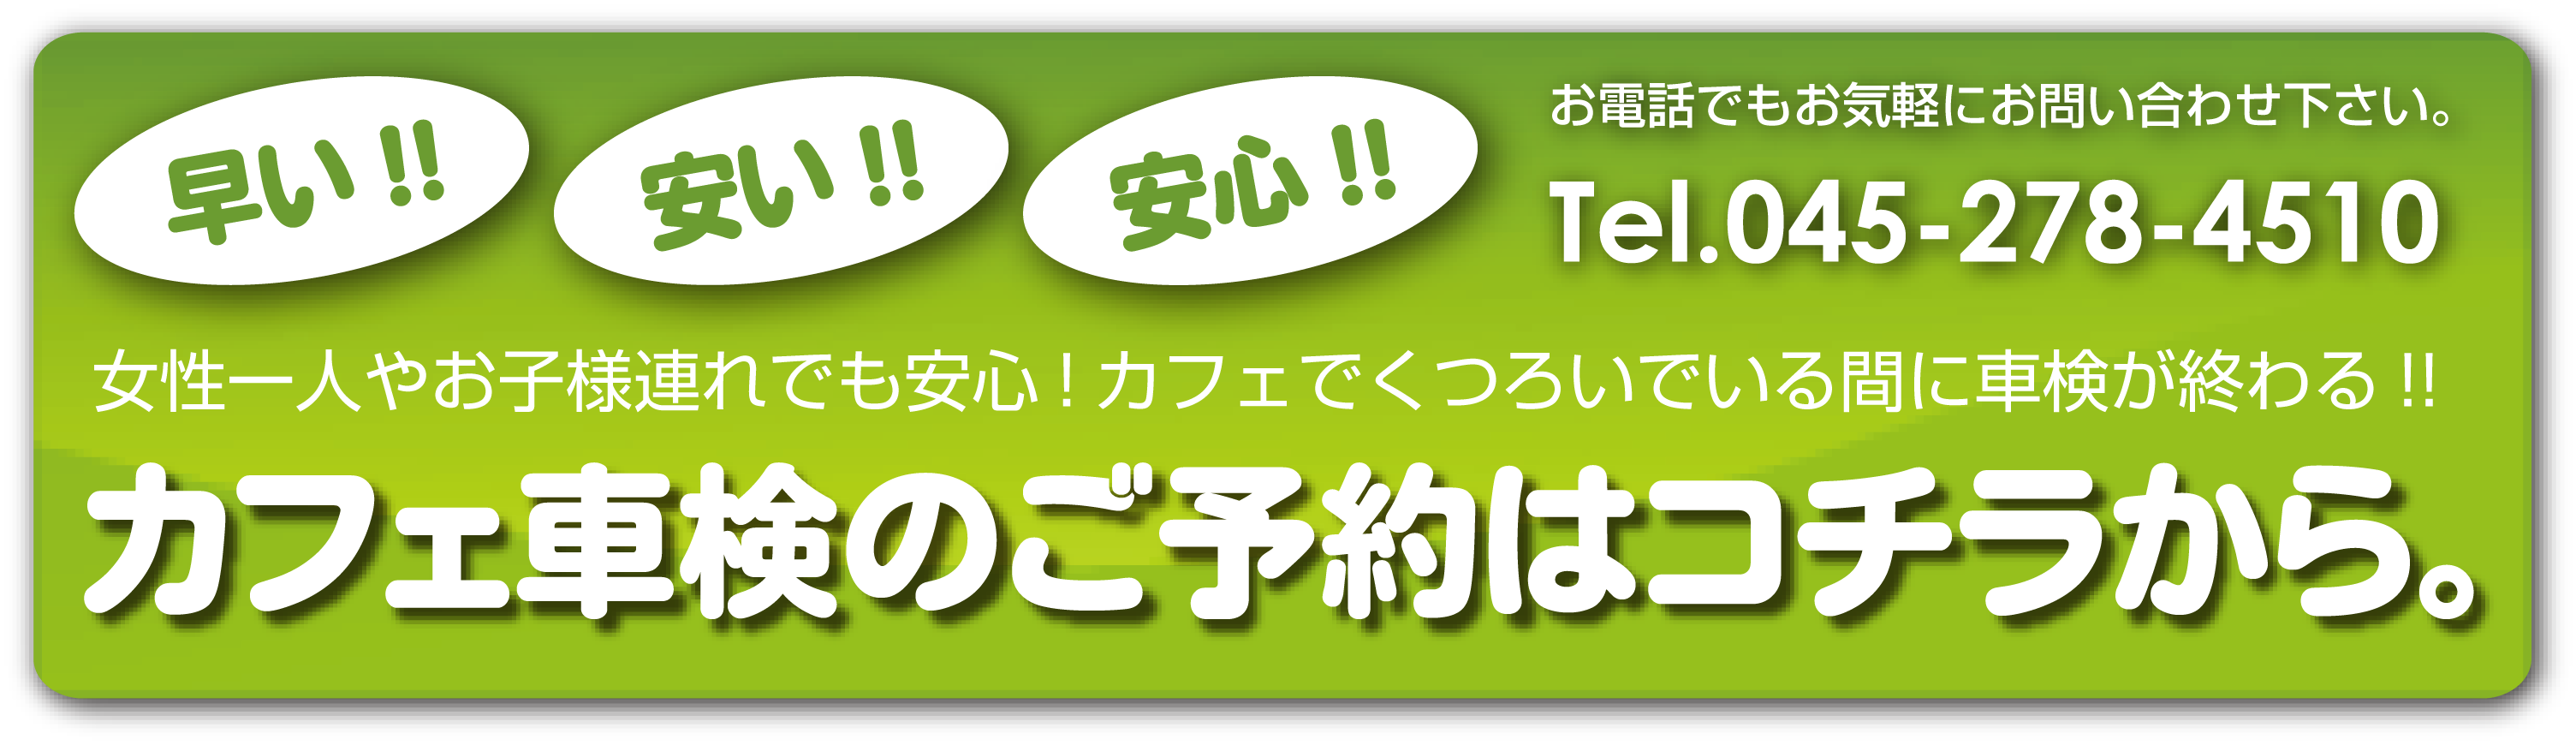 CAFE TIME_車検予約